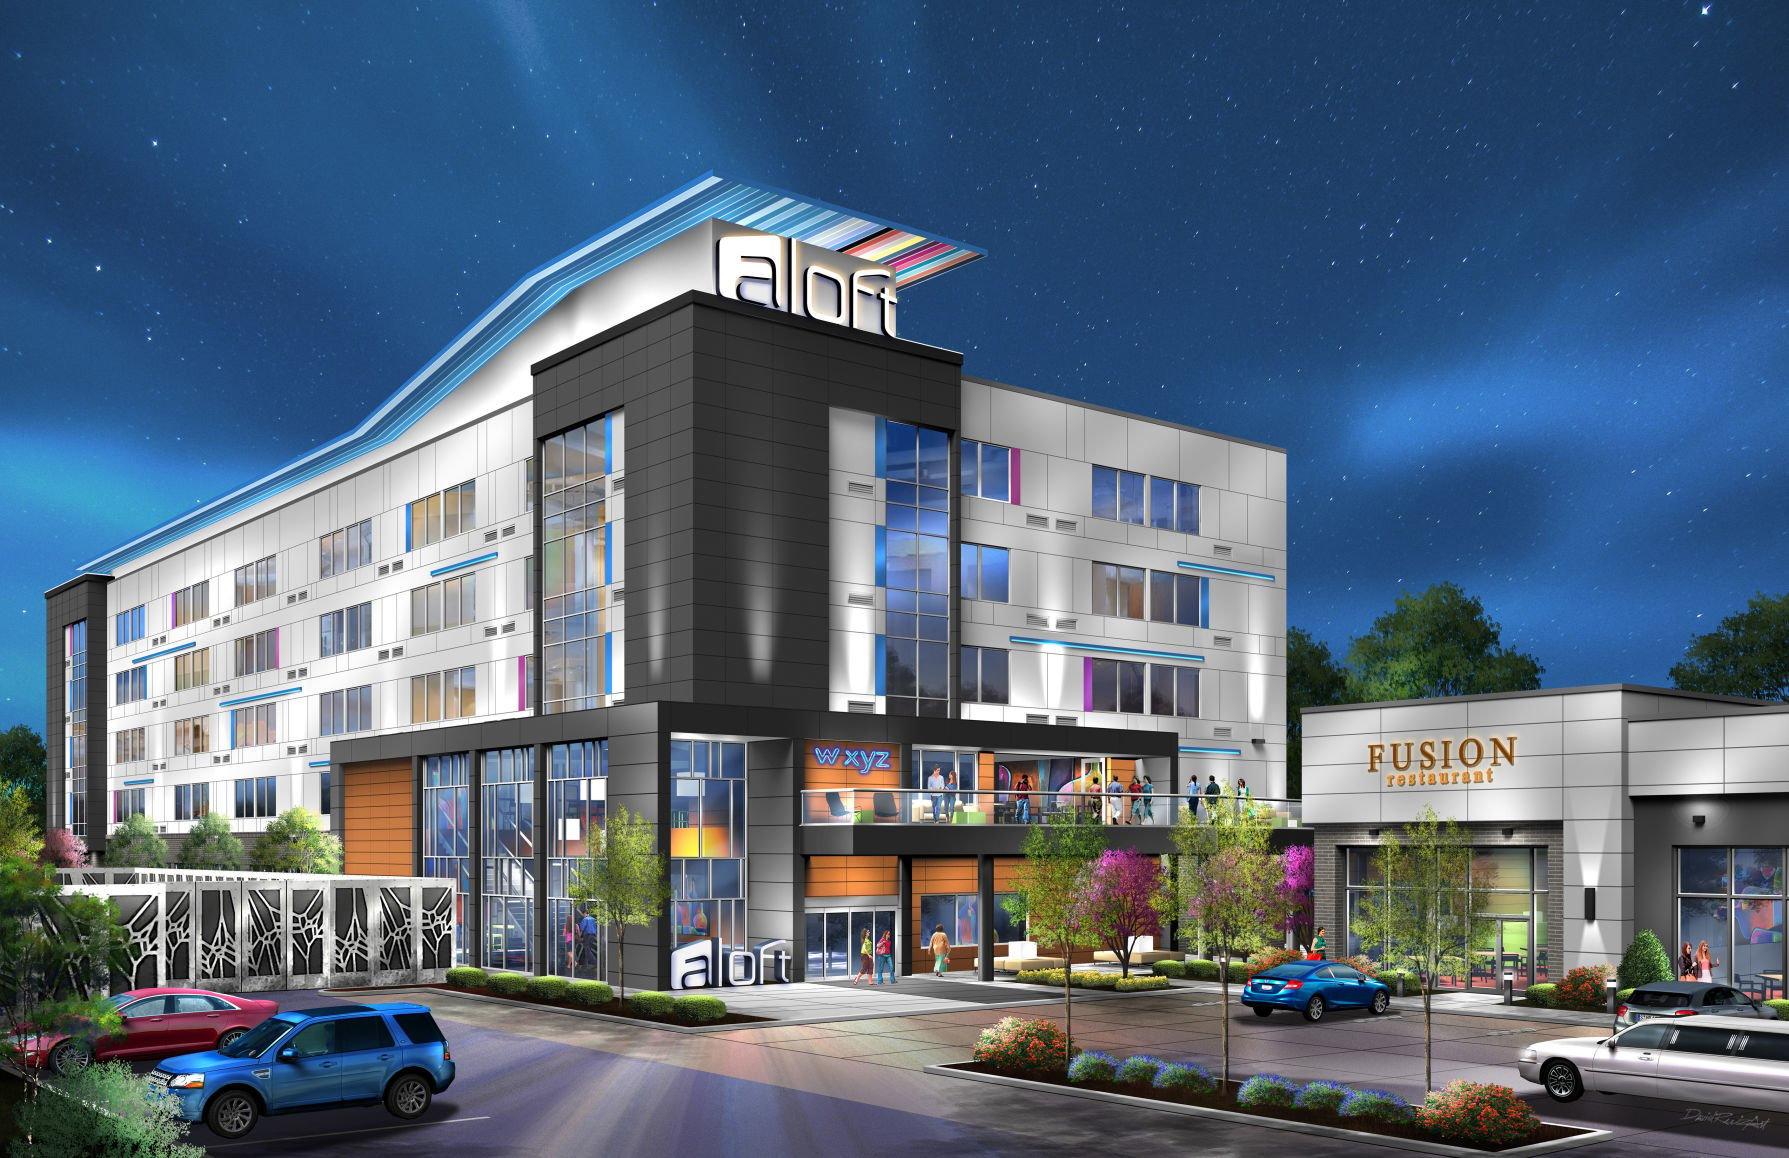 hotel operator midas launches 100 million fund to build bigger rh stltoday com